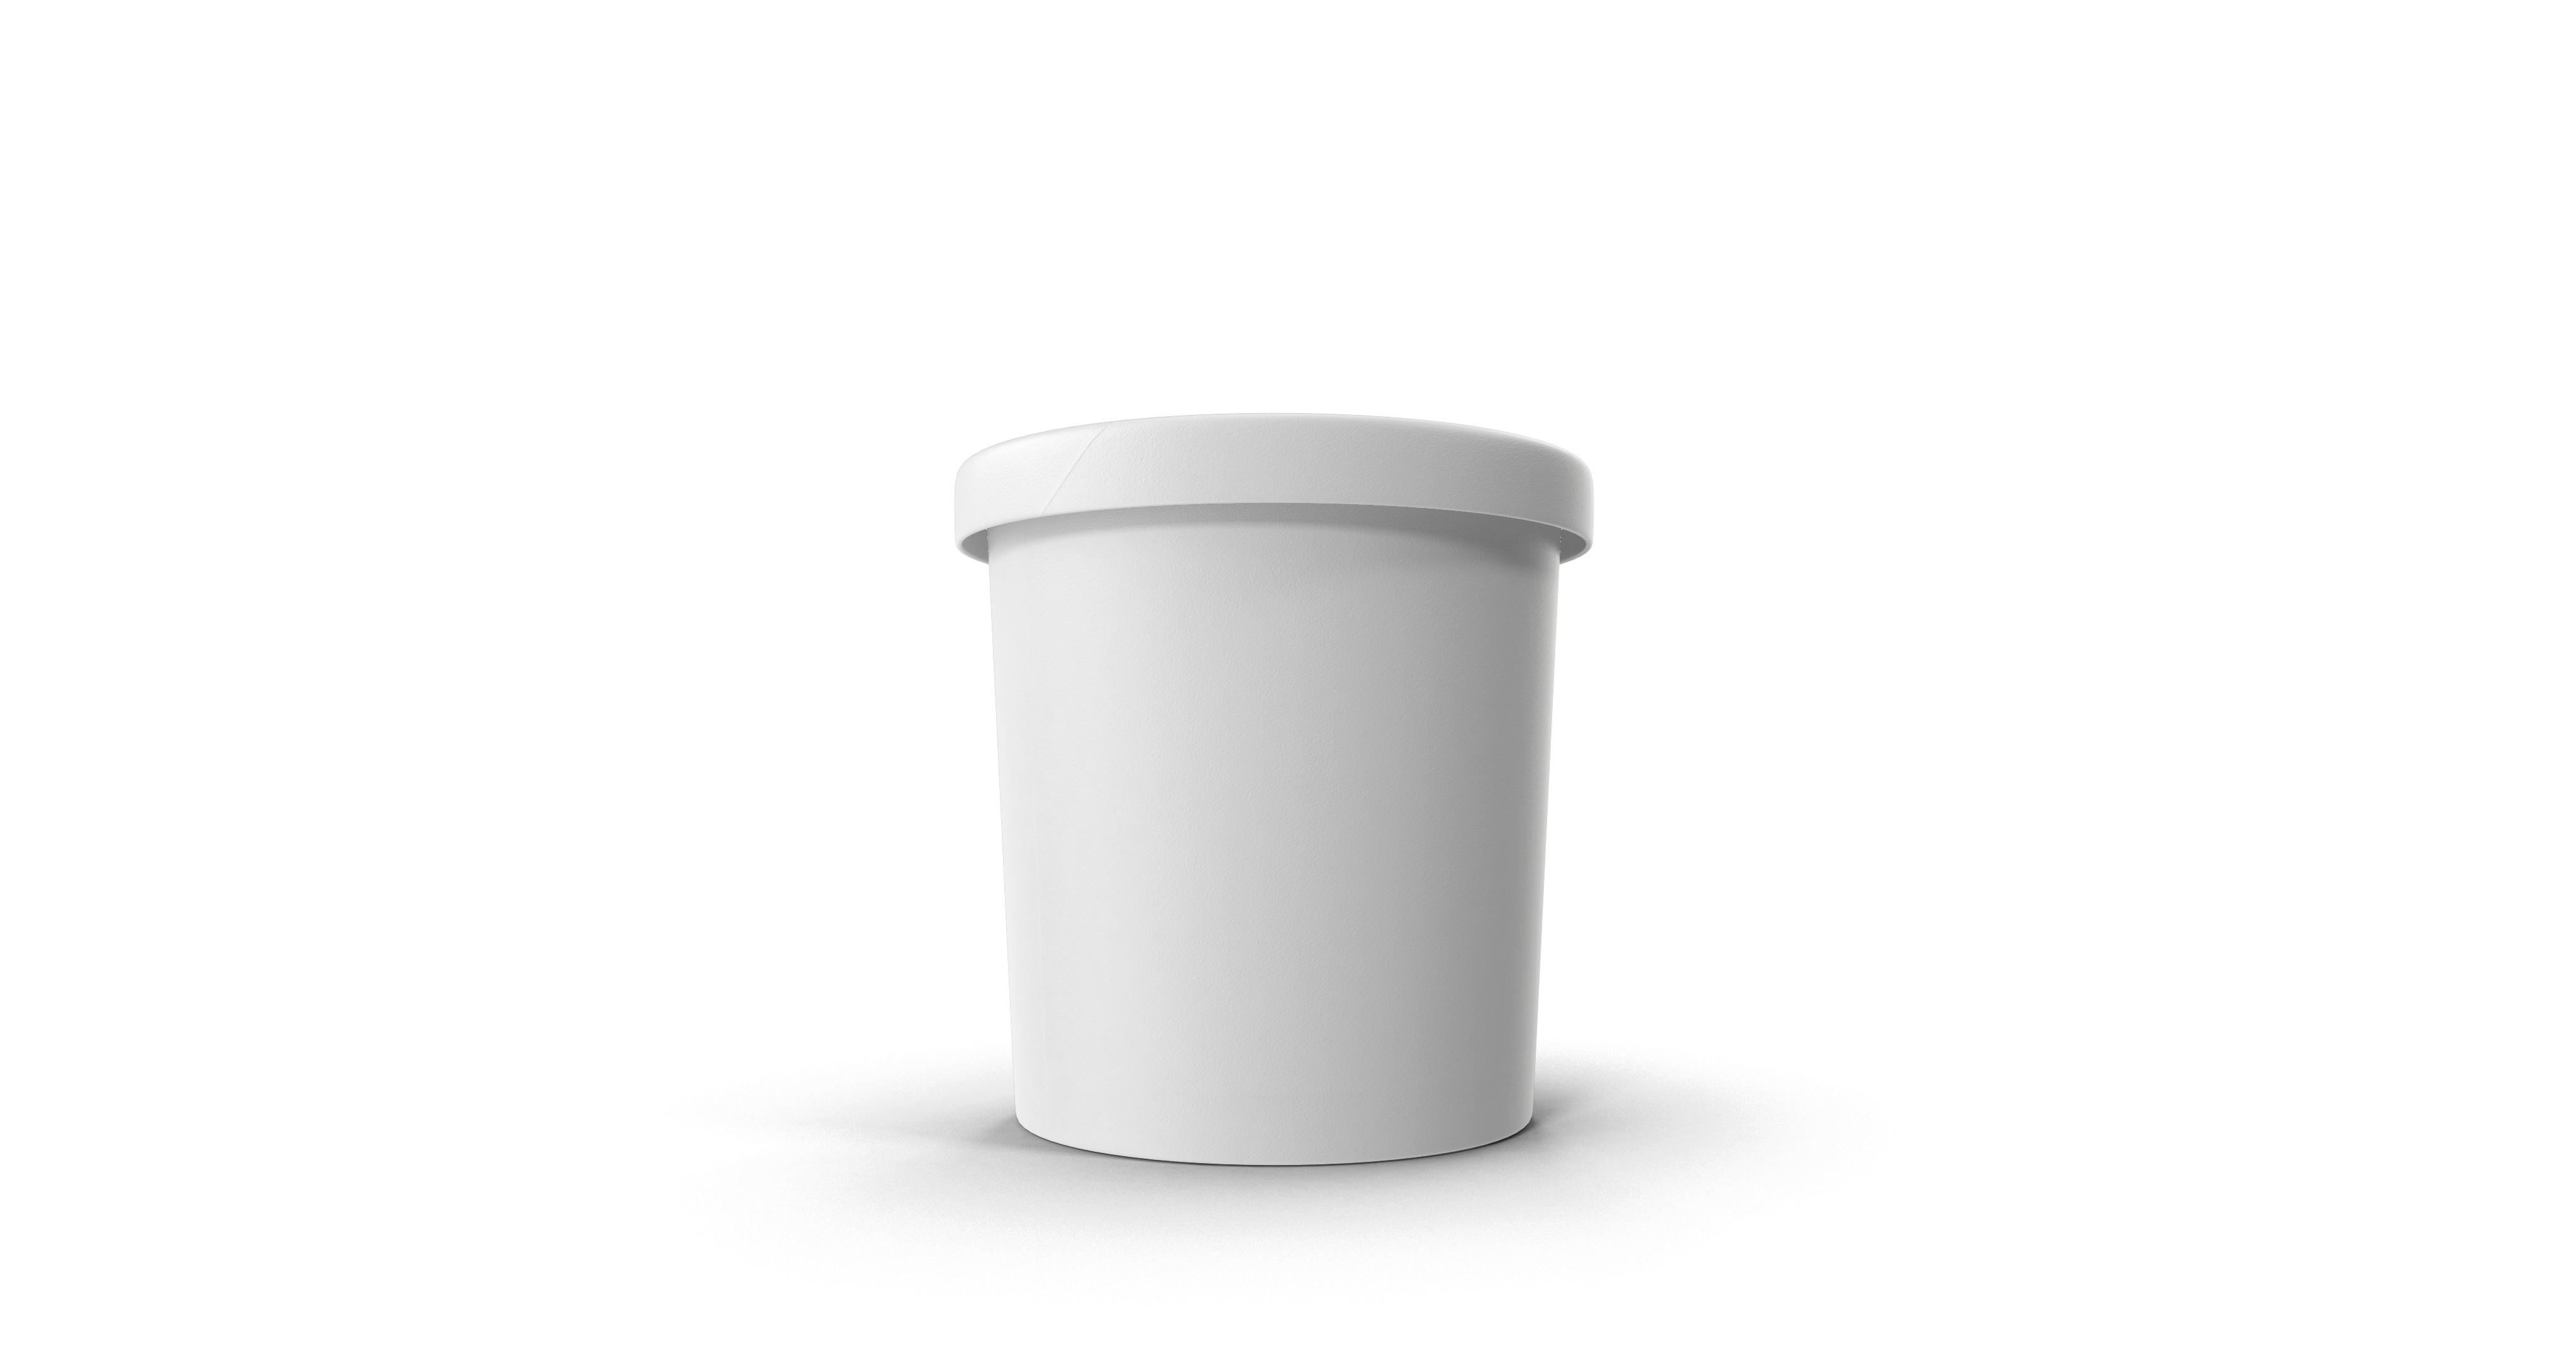 Ice Cream Cup Mockup example image 2